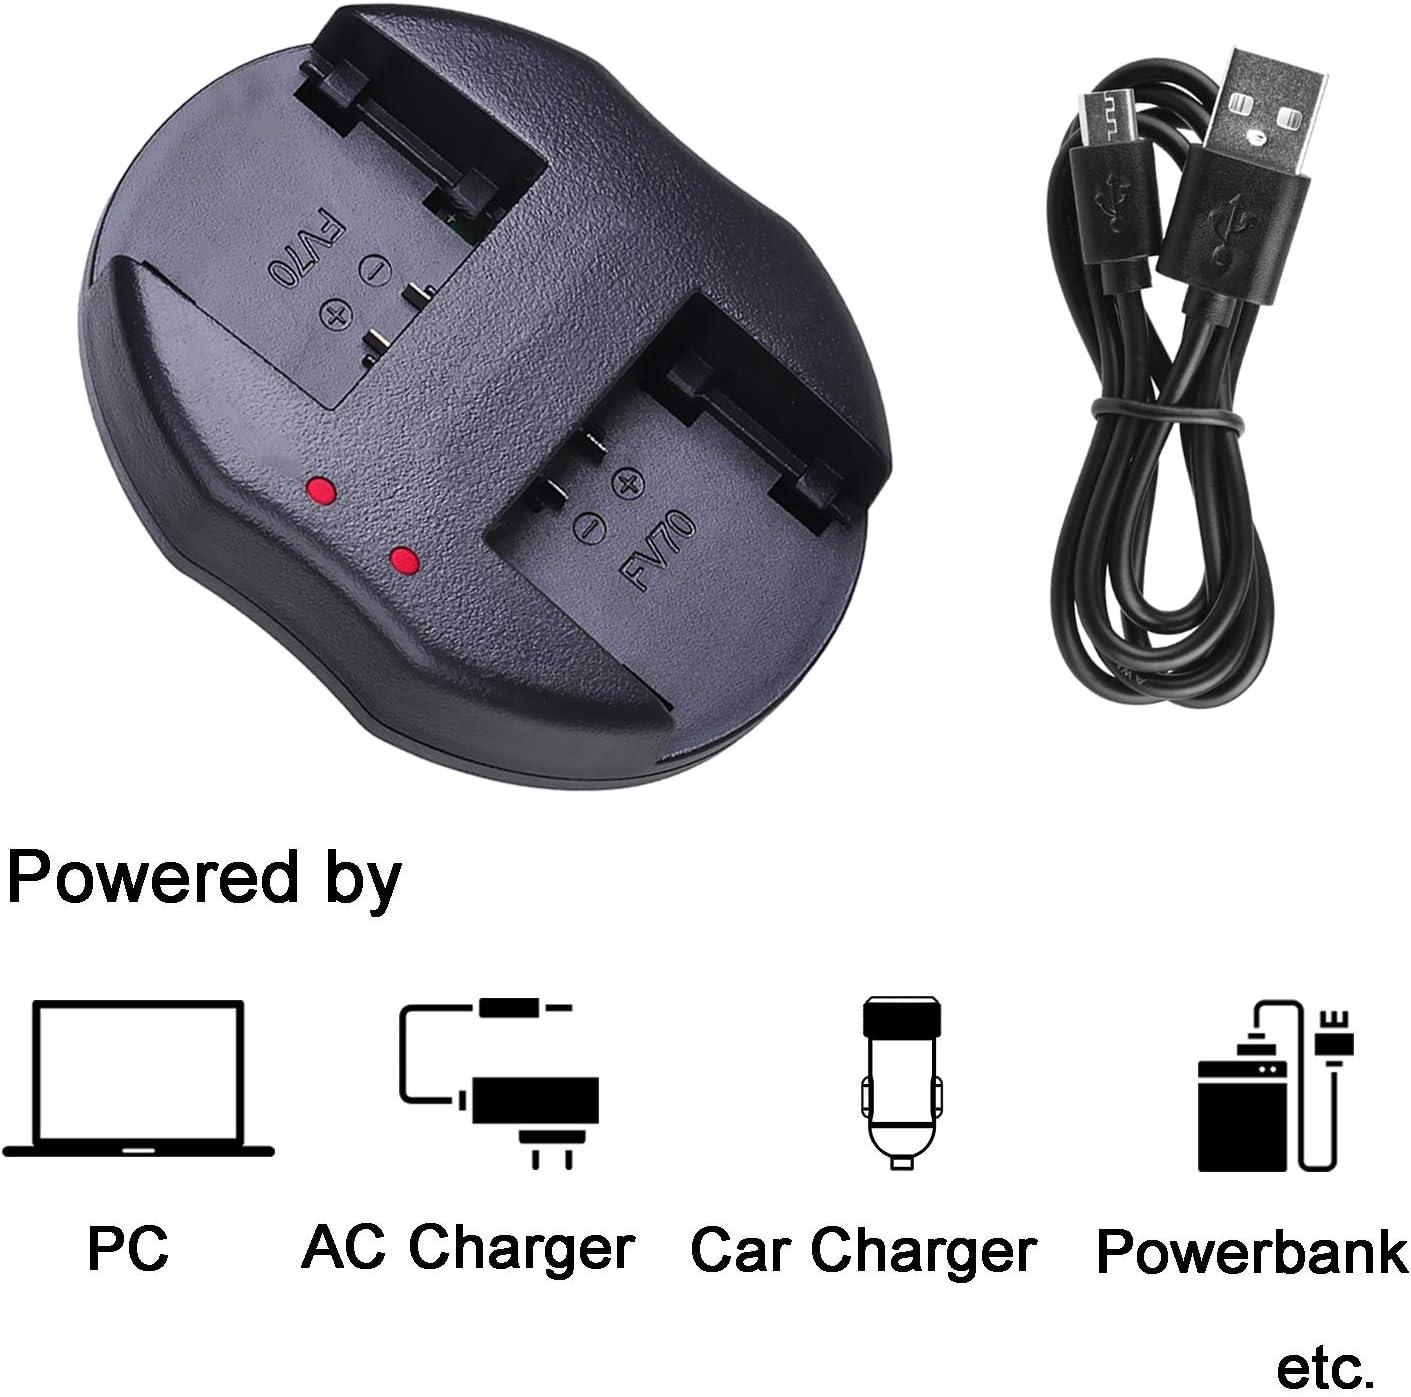 DCR-HC85 DCR-HC94 2 Pcs Battery and Dual Battery USB Charger for Sony DCR-HC65 DCR-HC96E Handycam Camcorder DCR-HC65E DCR-HC94E DCR-HC96 DCR-HC85E